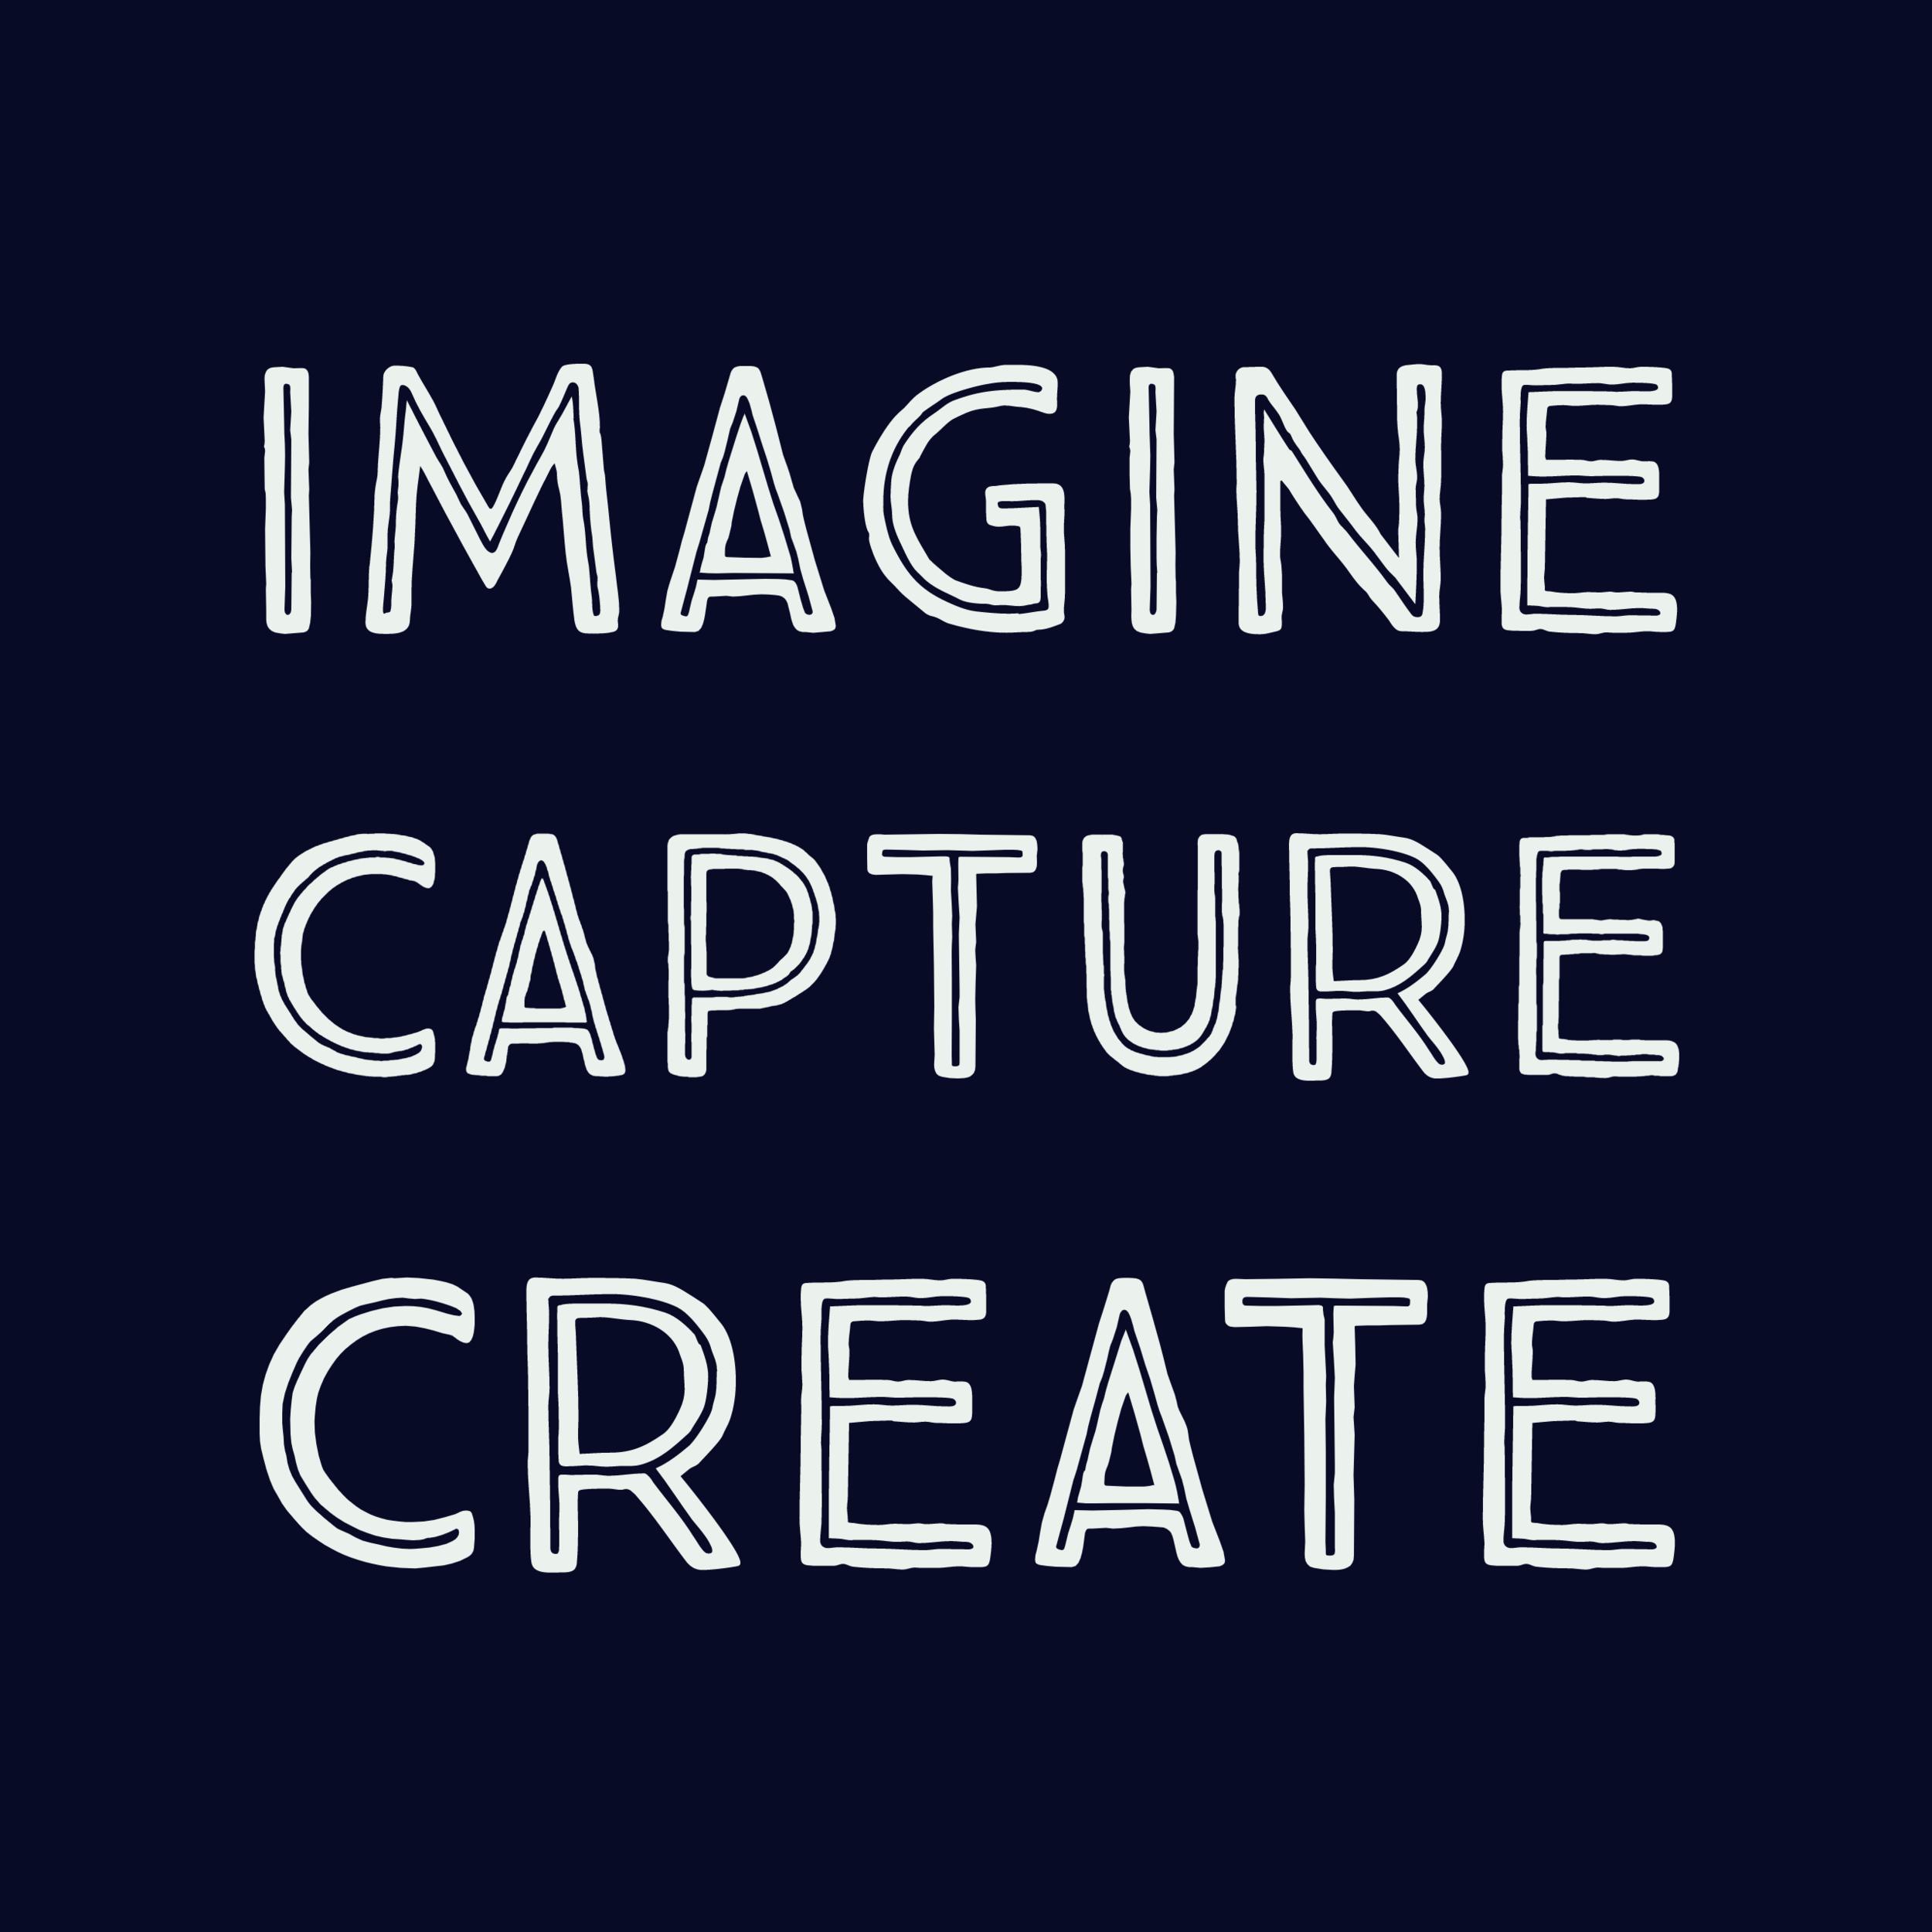 imagine capture create.png